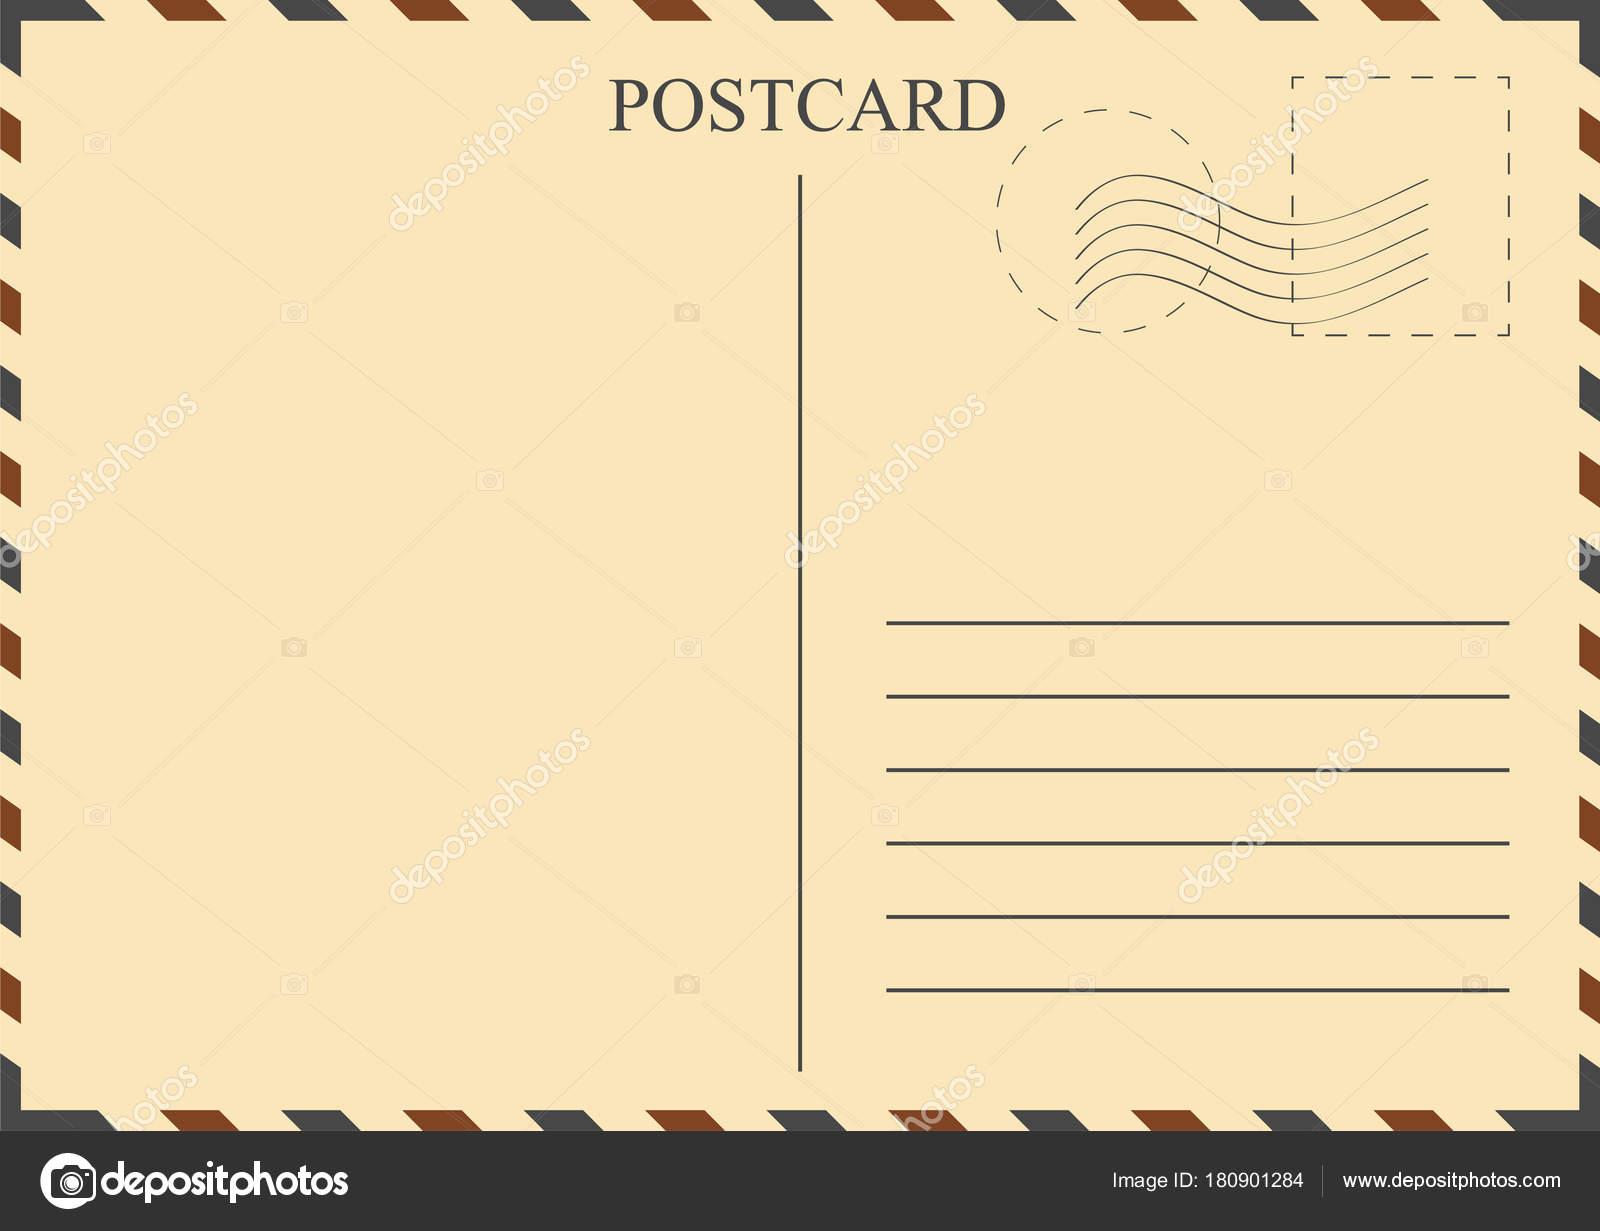 Postkarte-Vorlage. Alte Ansichtskarte mit Stempel — Stockvektor ...